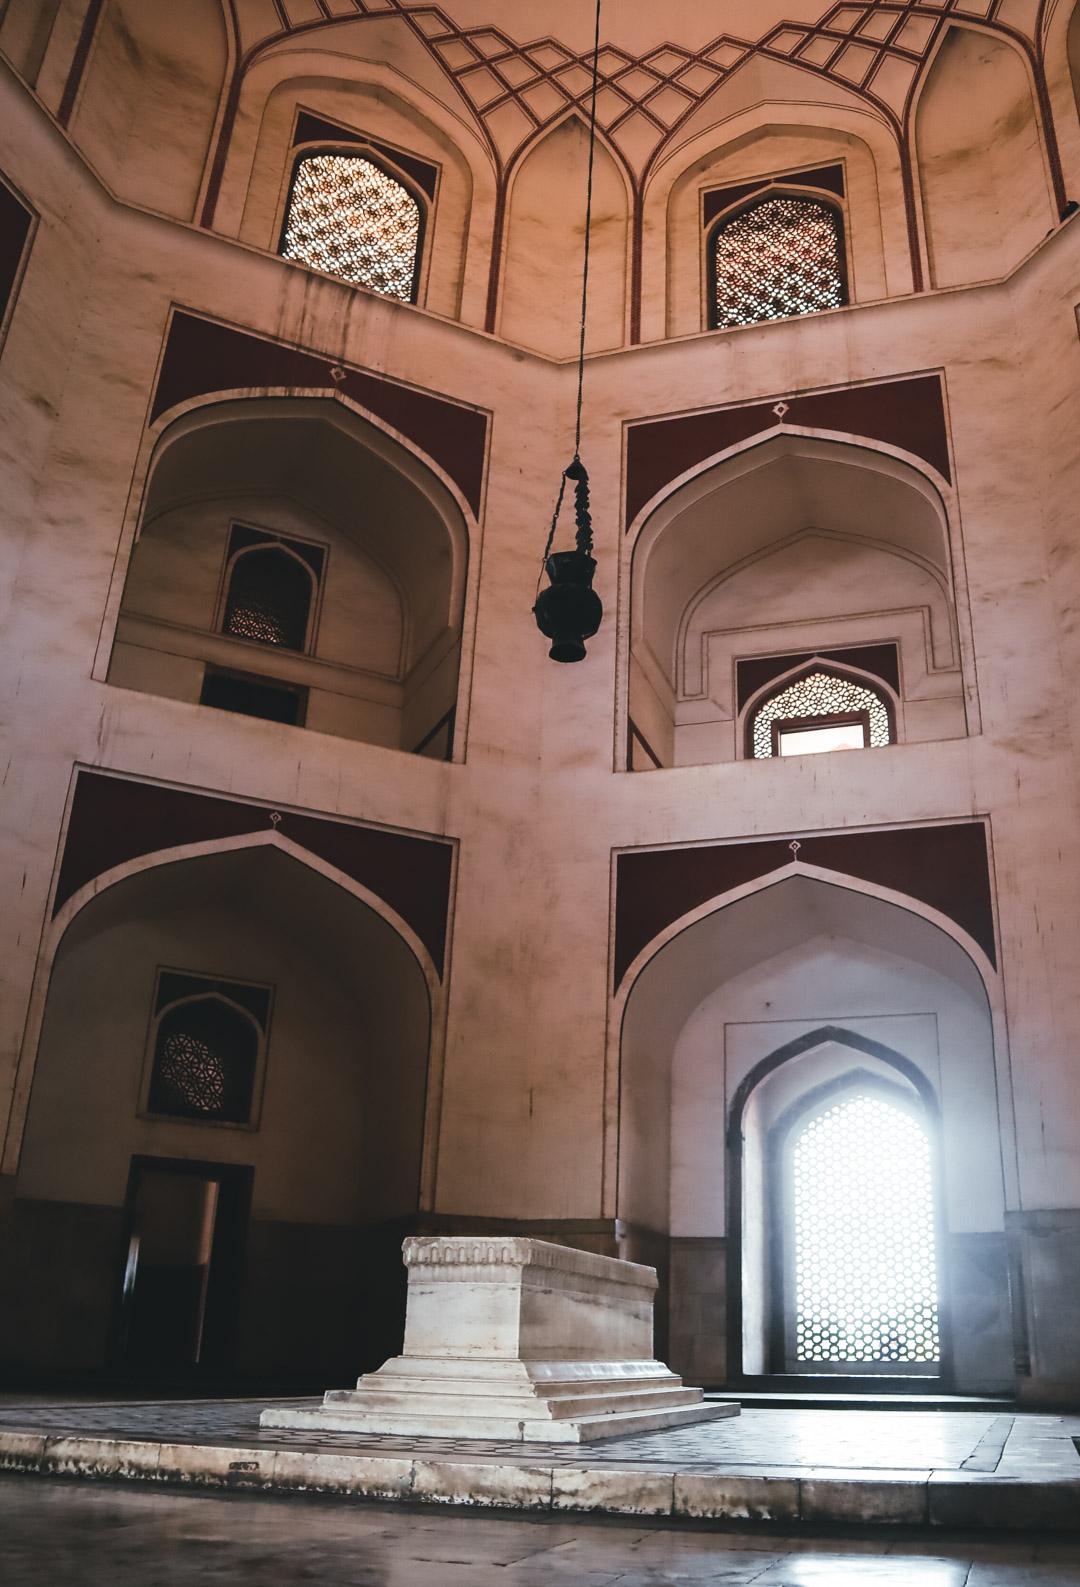 Humayun's Tomb - Wanderlustgary